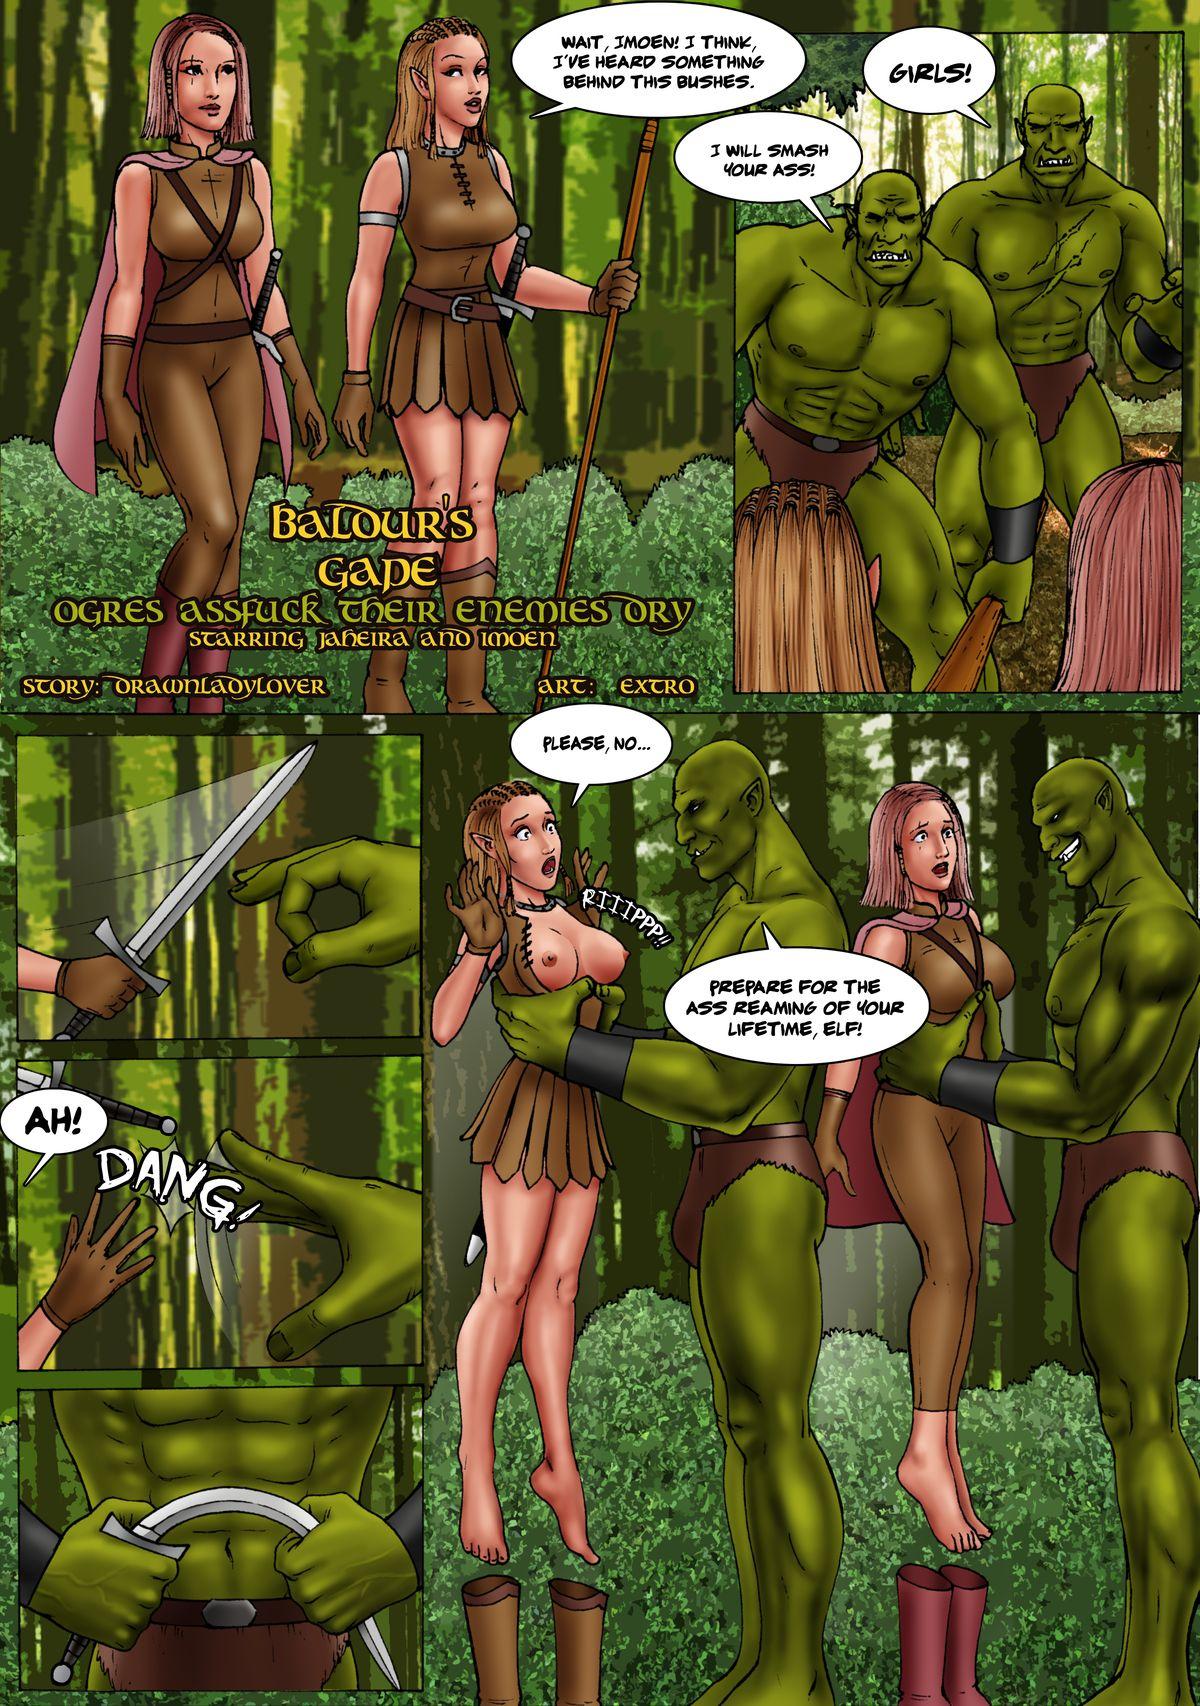 Extro Baldur S Gape Ogres Assfuck Their Enemies Dry Baldur S Gate Hentai Online Porn Manga